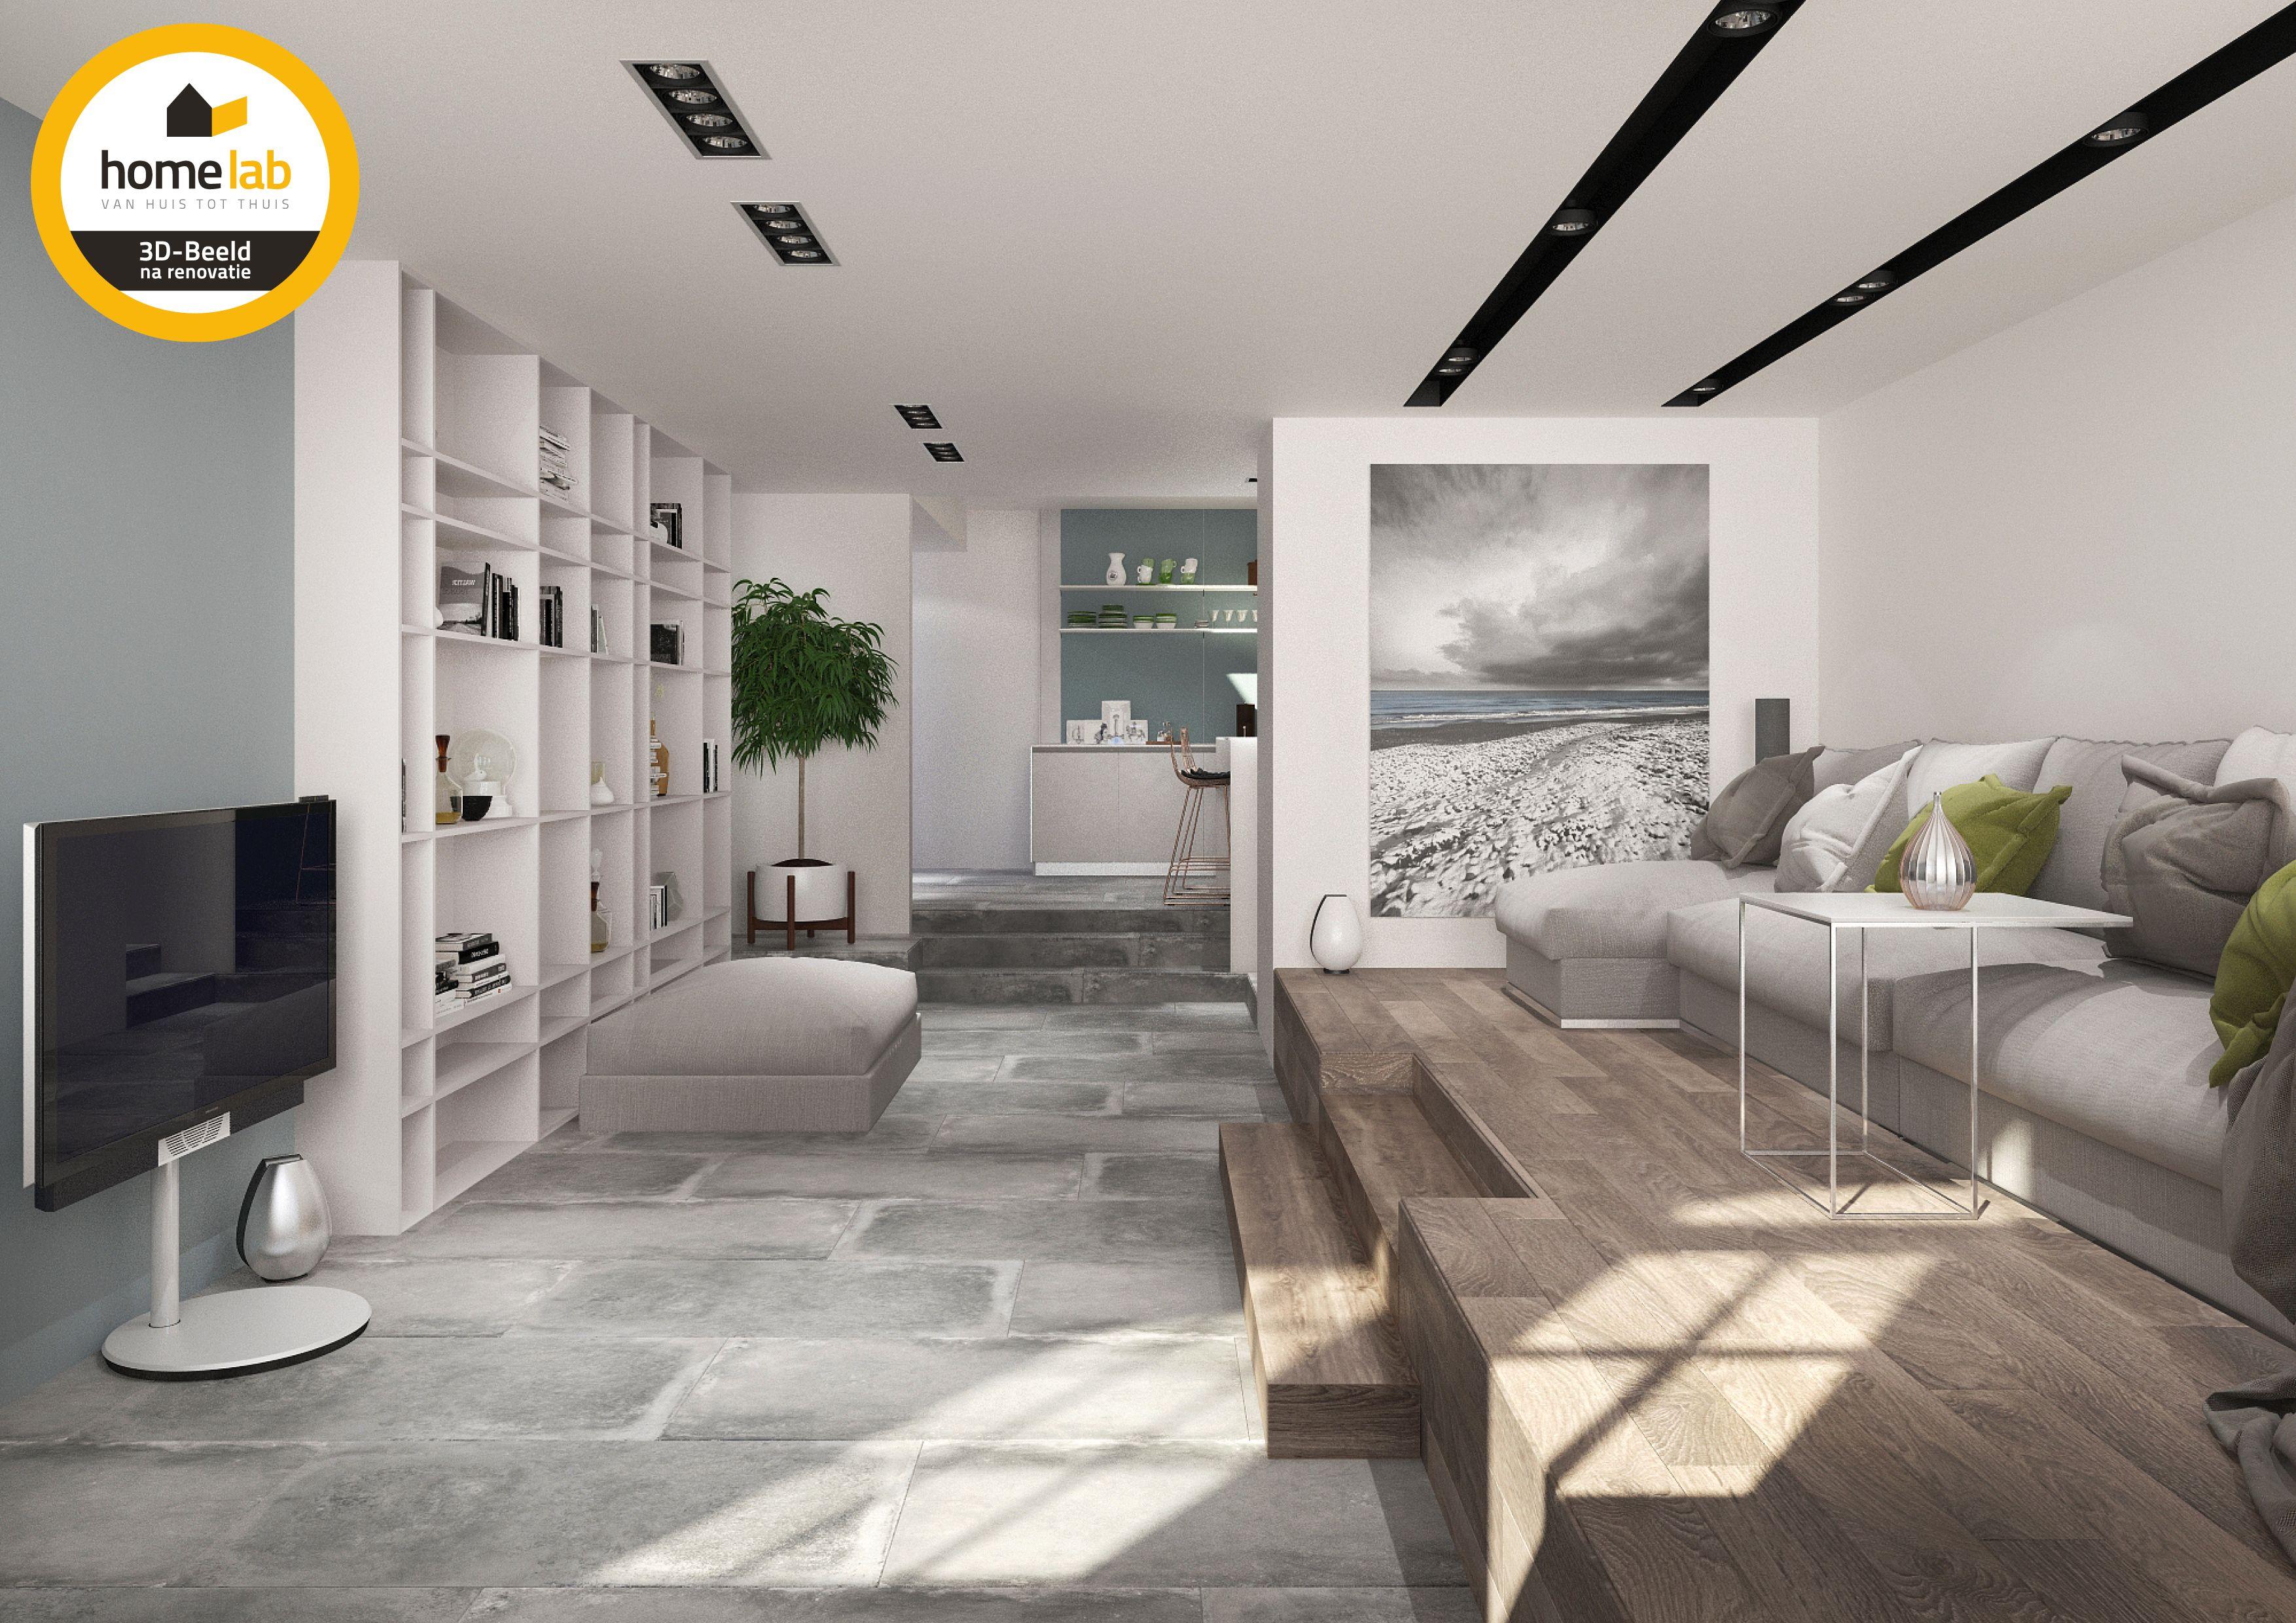 Gezellige woonkamer met hout afgewerkt #homelab #homelabprojects ...